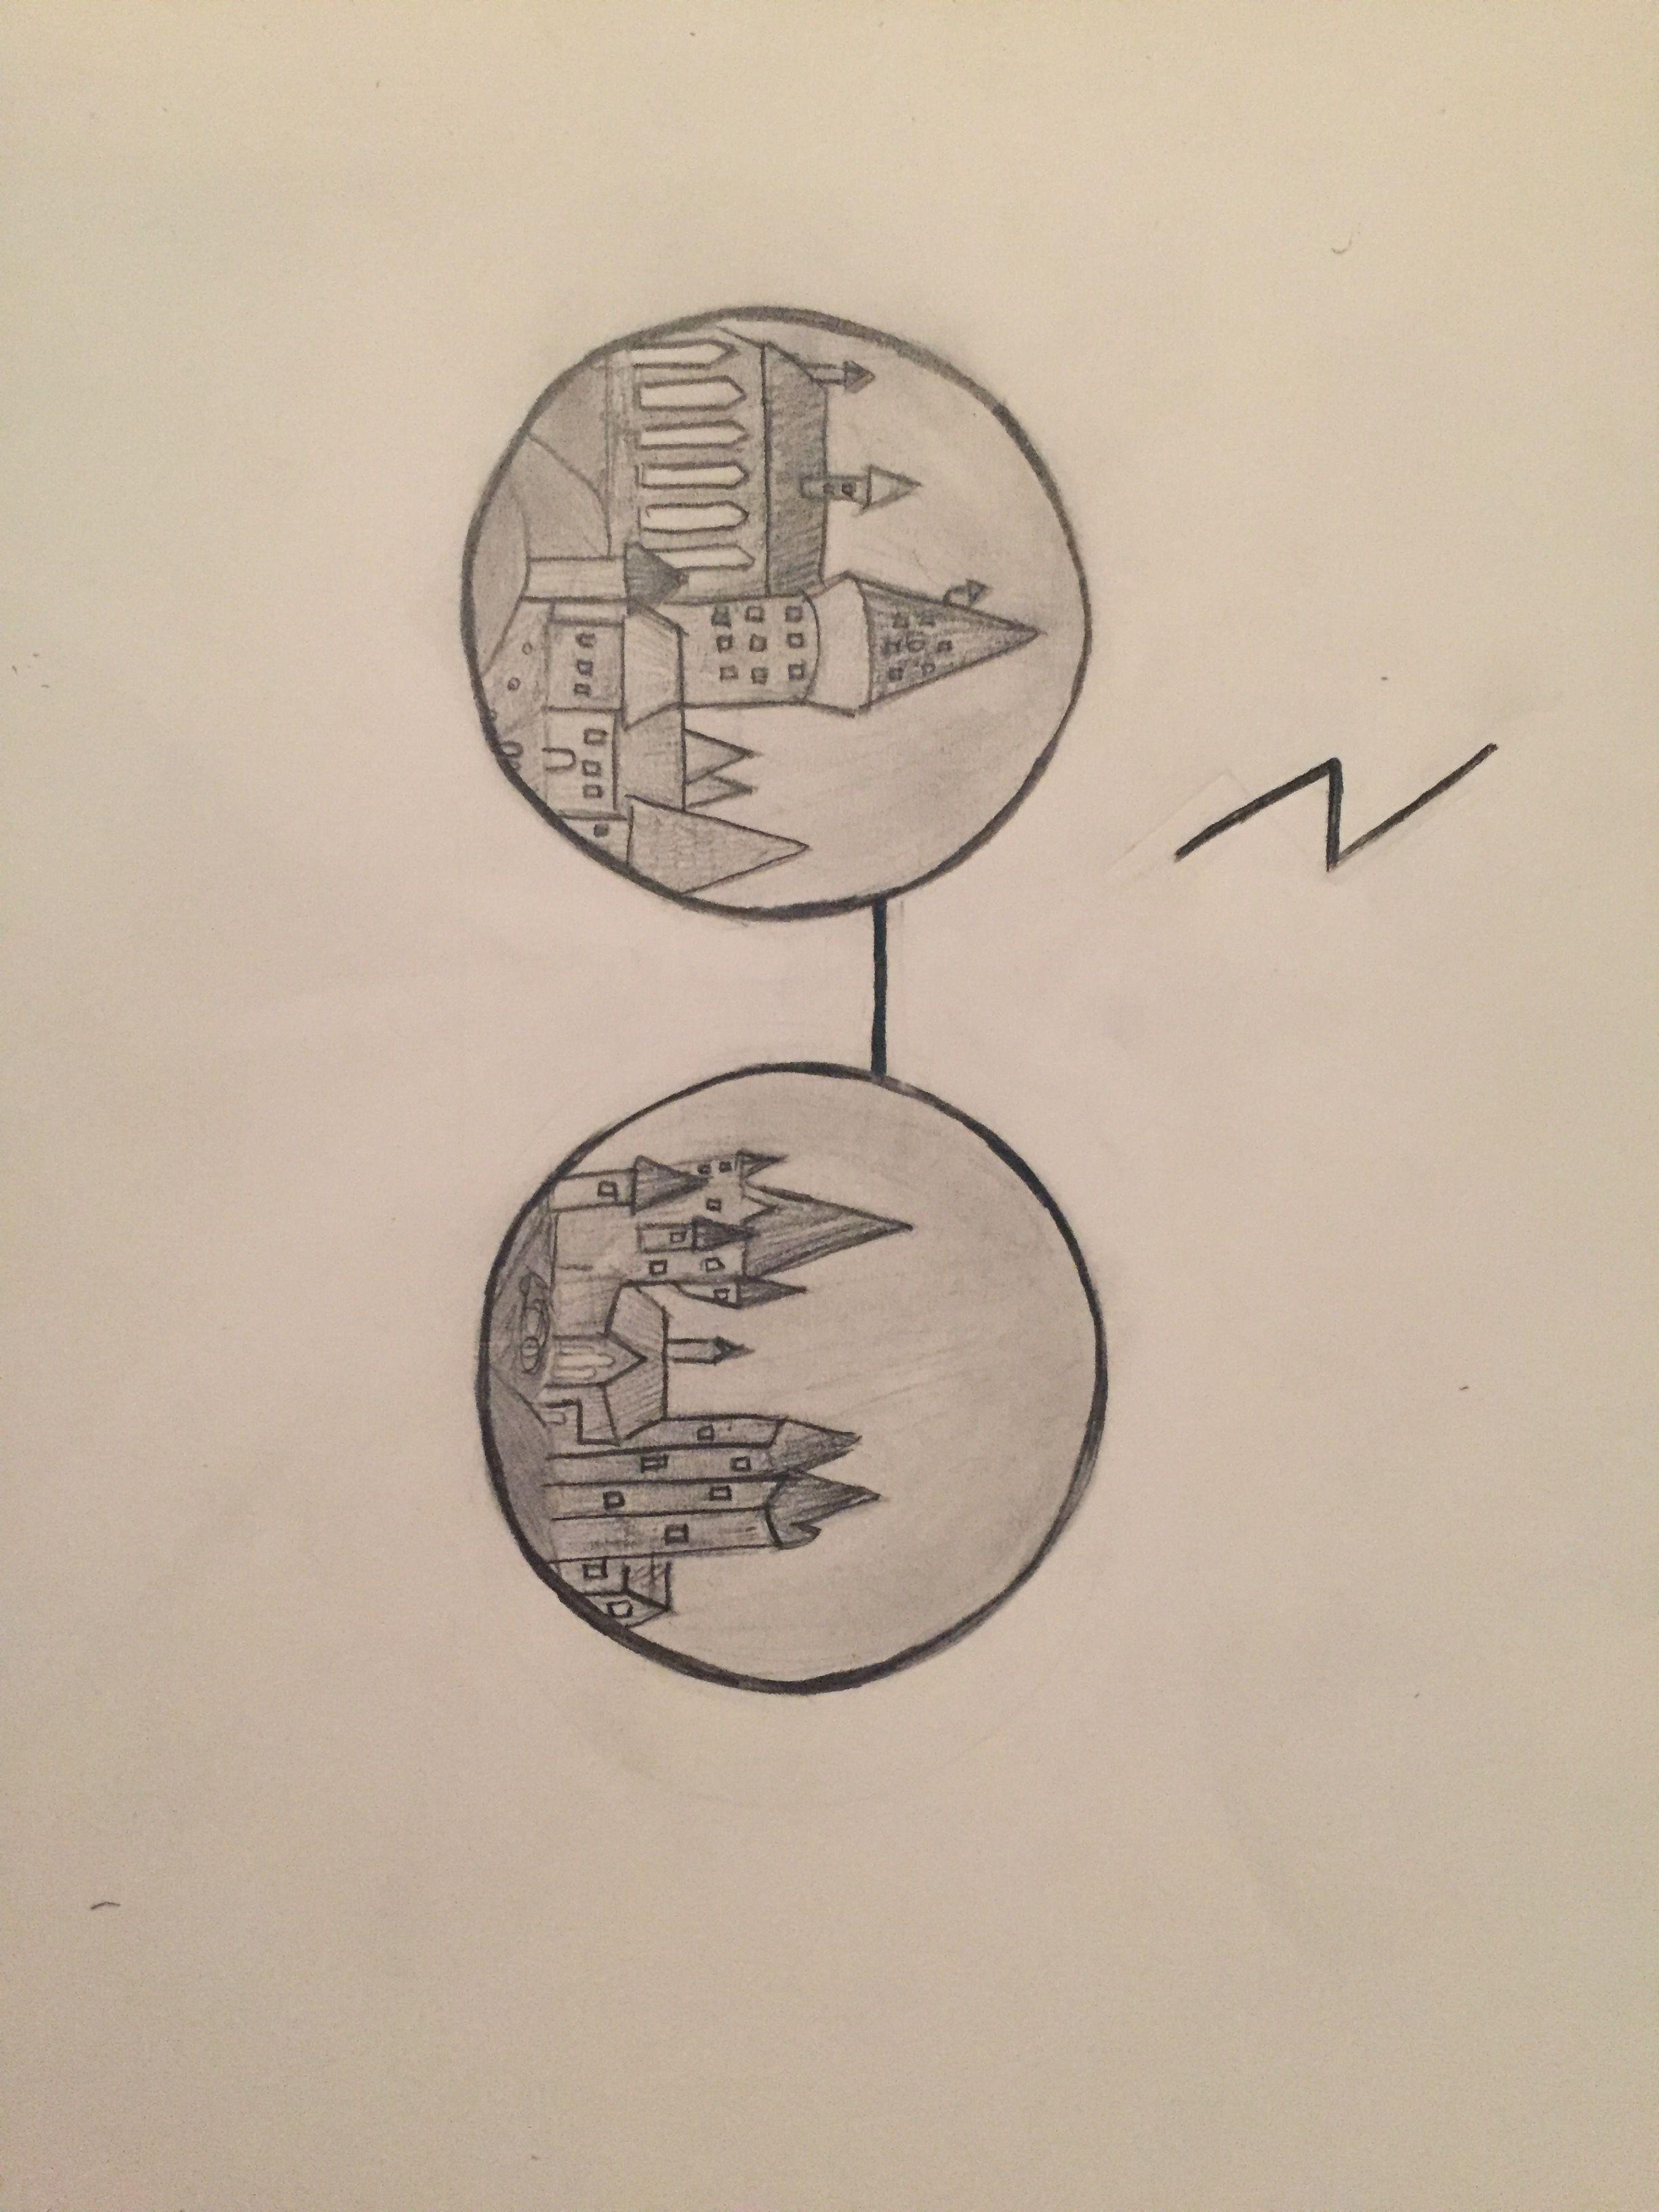 Harry potter drawing of hogwarts